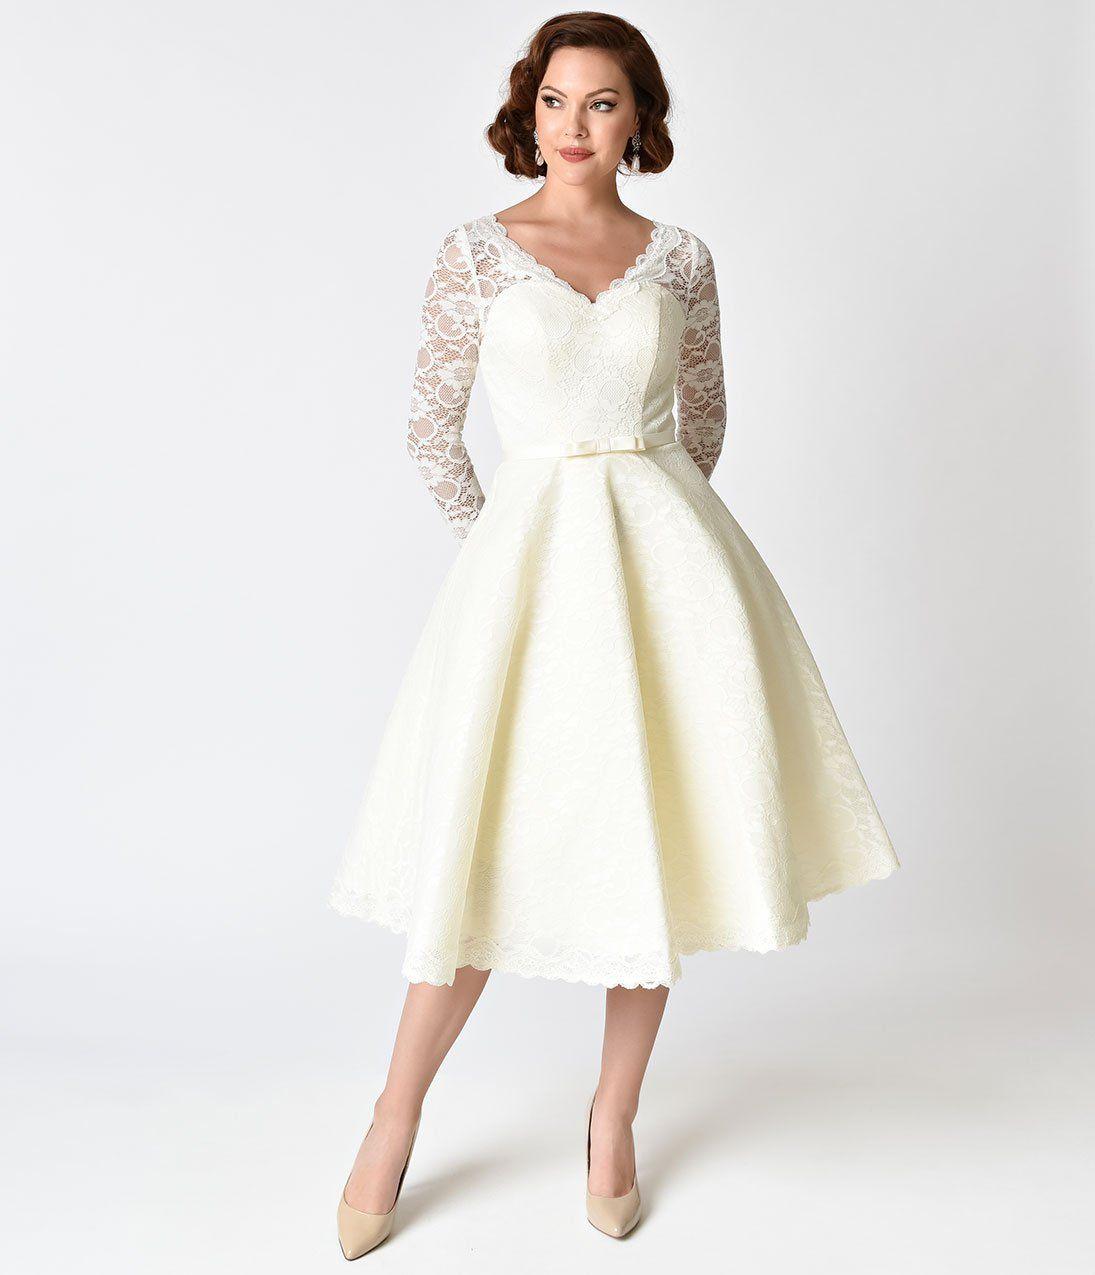 Vintage Inspired Wedding Dresses Lace Tea Length Styles Unique Vintage Swing Dress Wedding Dresses Unique White Vintage Dress